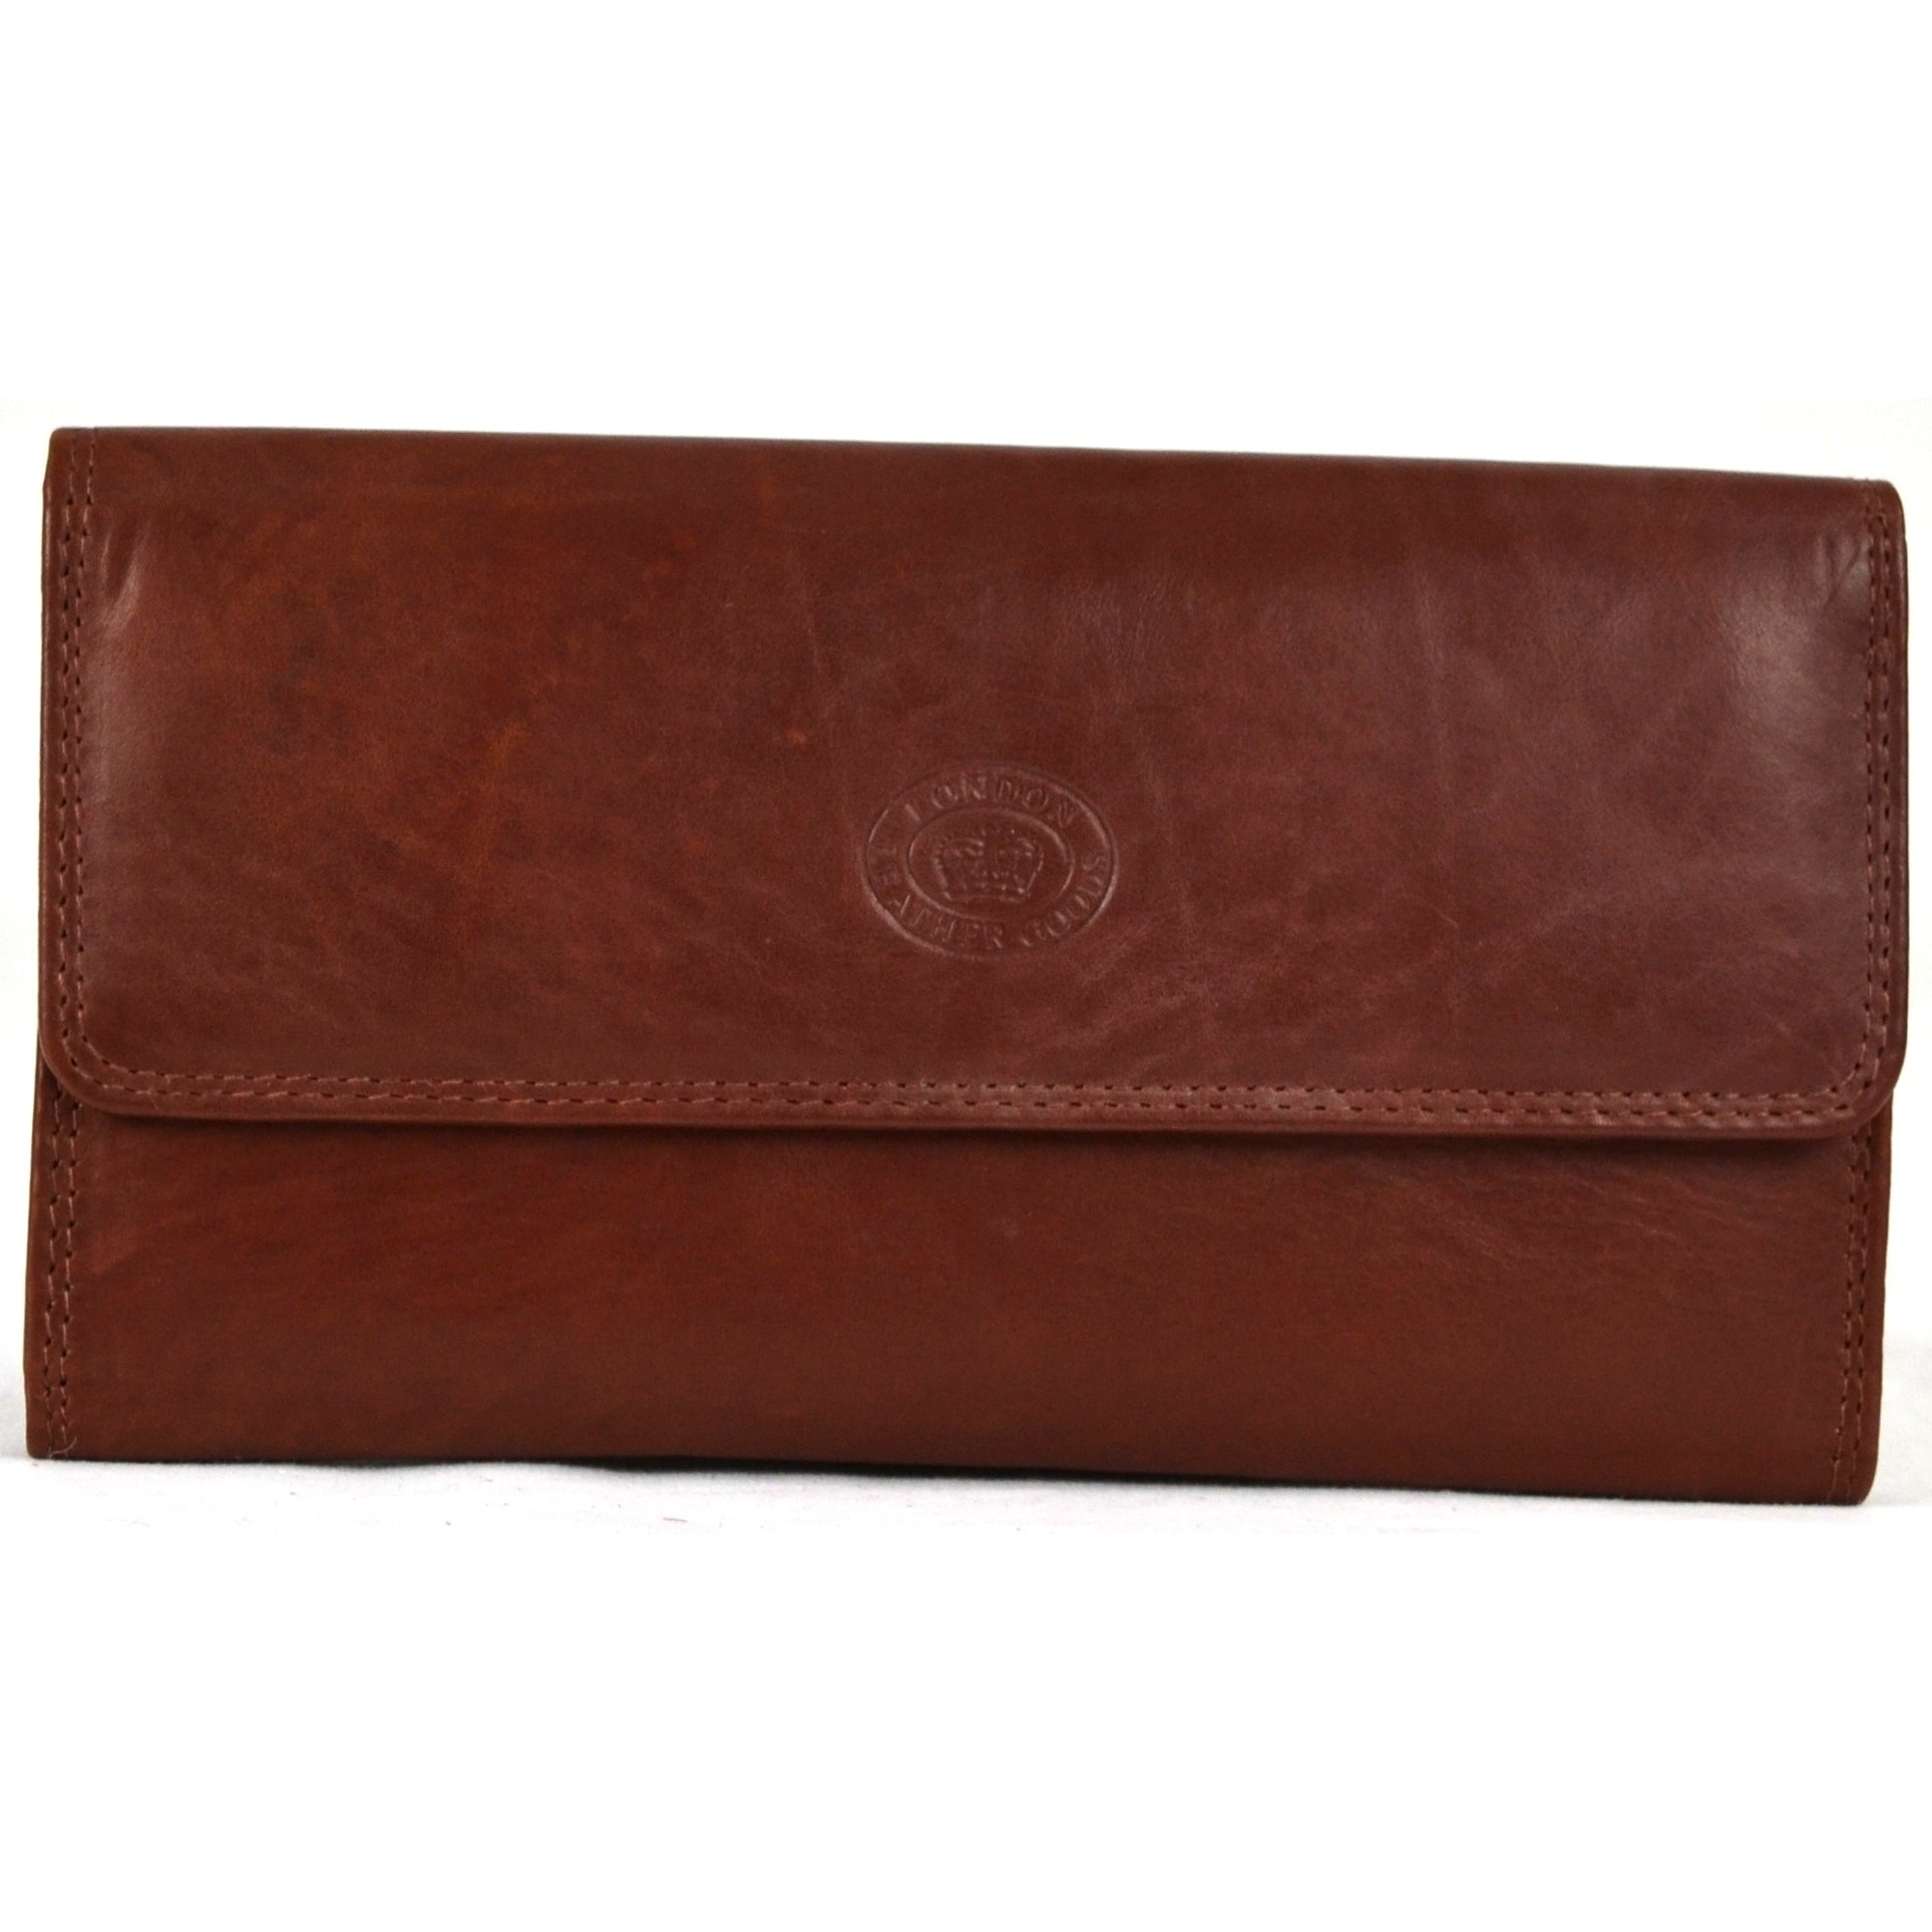 36707bc719f Large Soft Nappa Leather Matinee Purse - Turquoise - SNUGRUGS